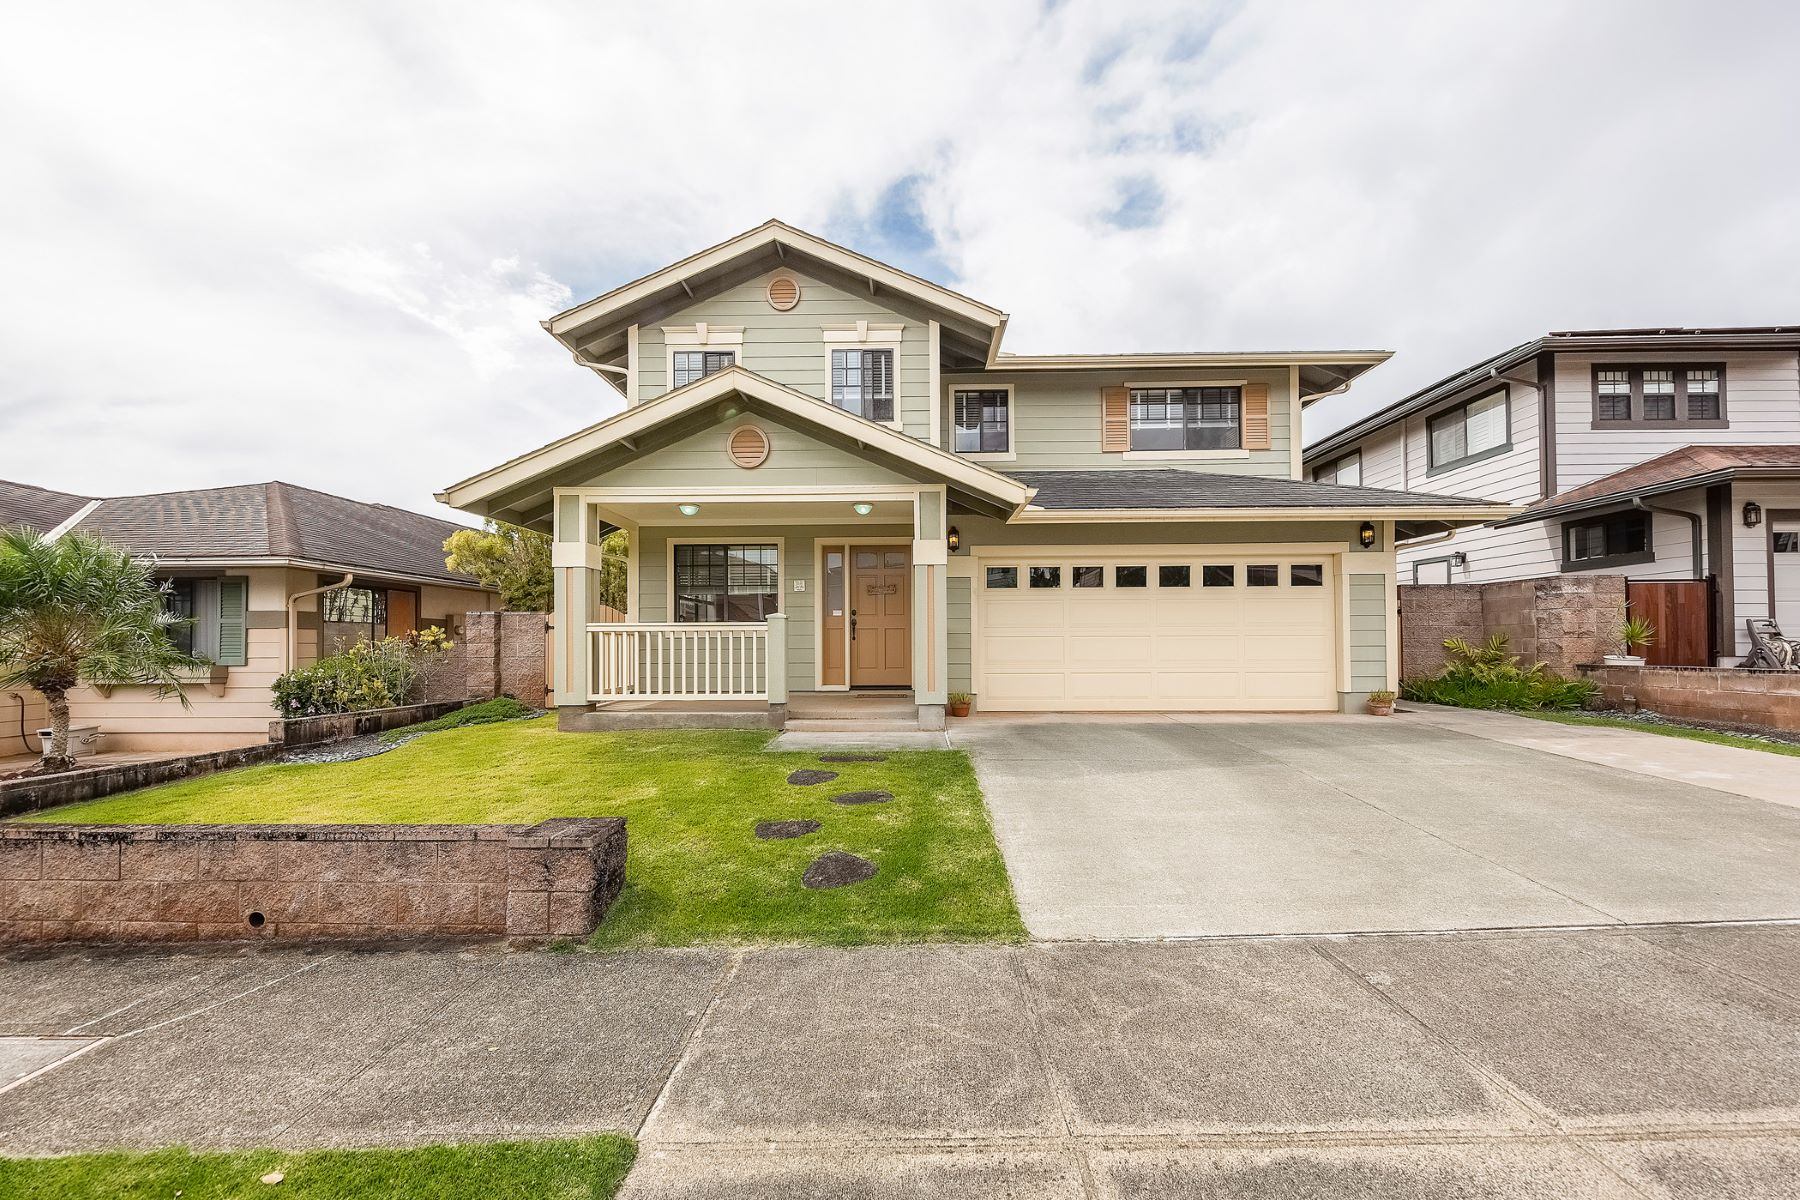 Single Family Home for Active at Single Family Home, Mililani Mauka, Mountain View 95-1060 Kihene St Mililani, Hawaii 96789 United States